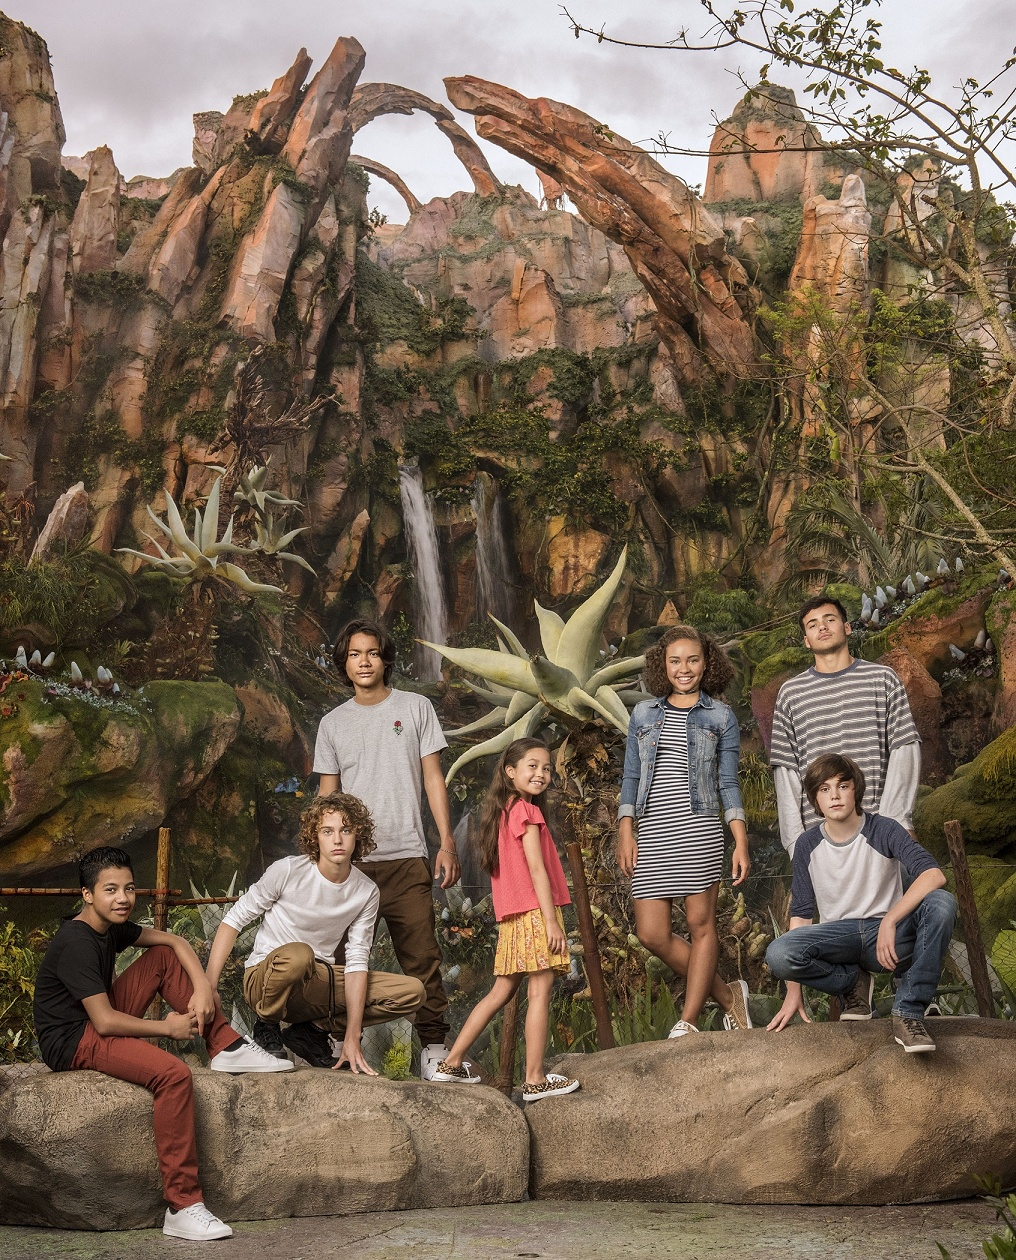 Avatar 2 Cast: New Cast For James Cameron's AVATAR Sequels Unveiled As